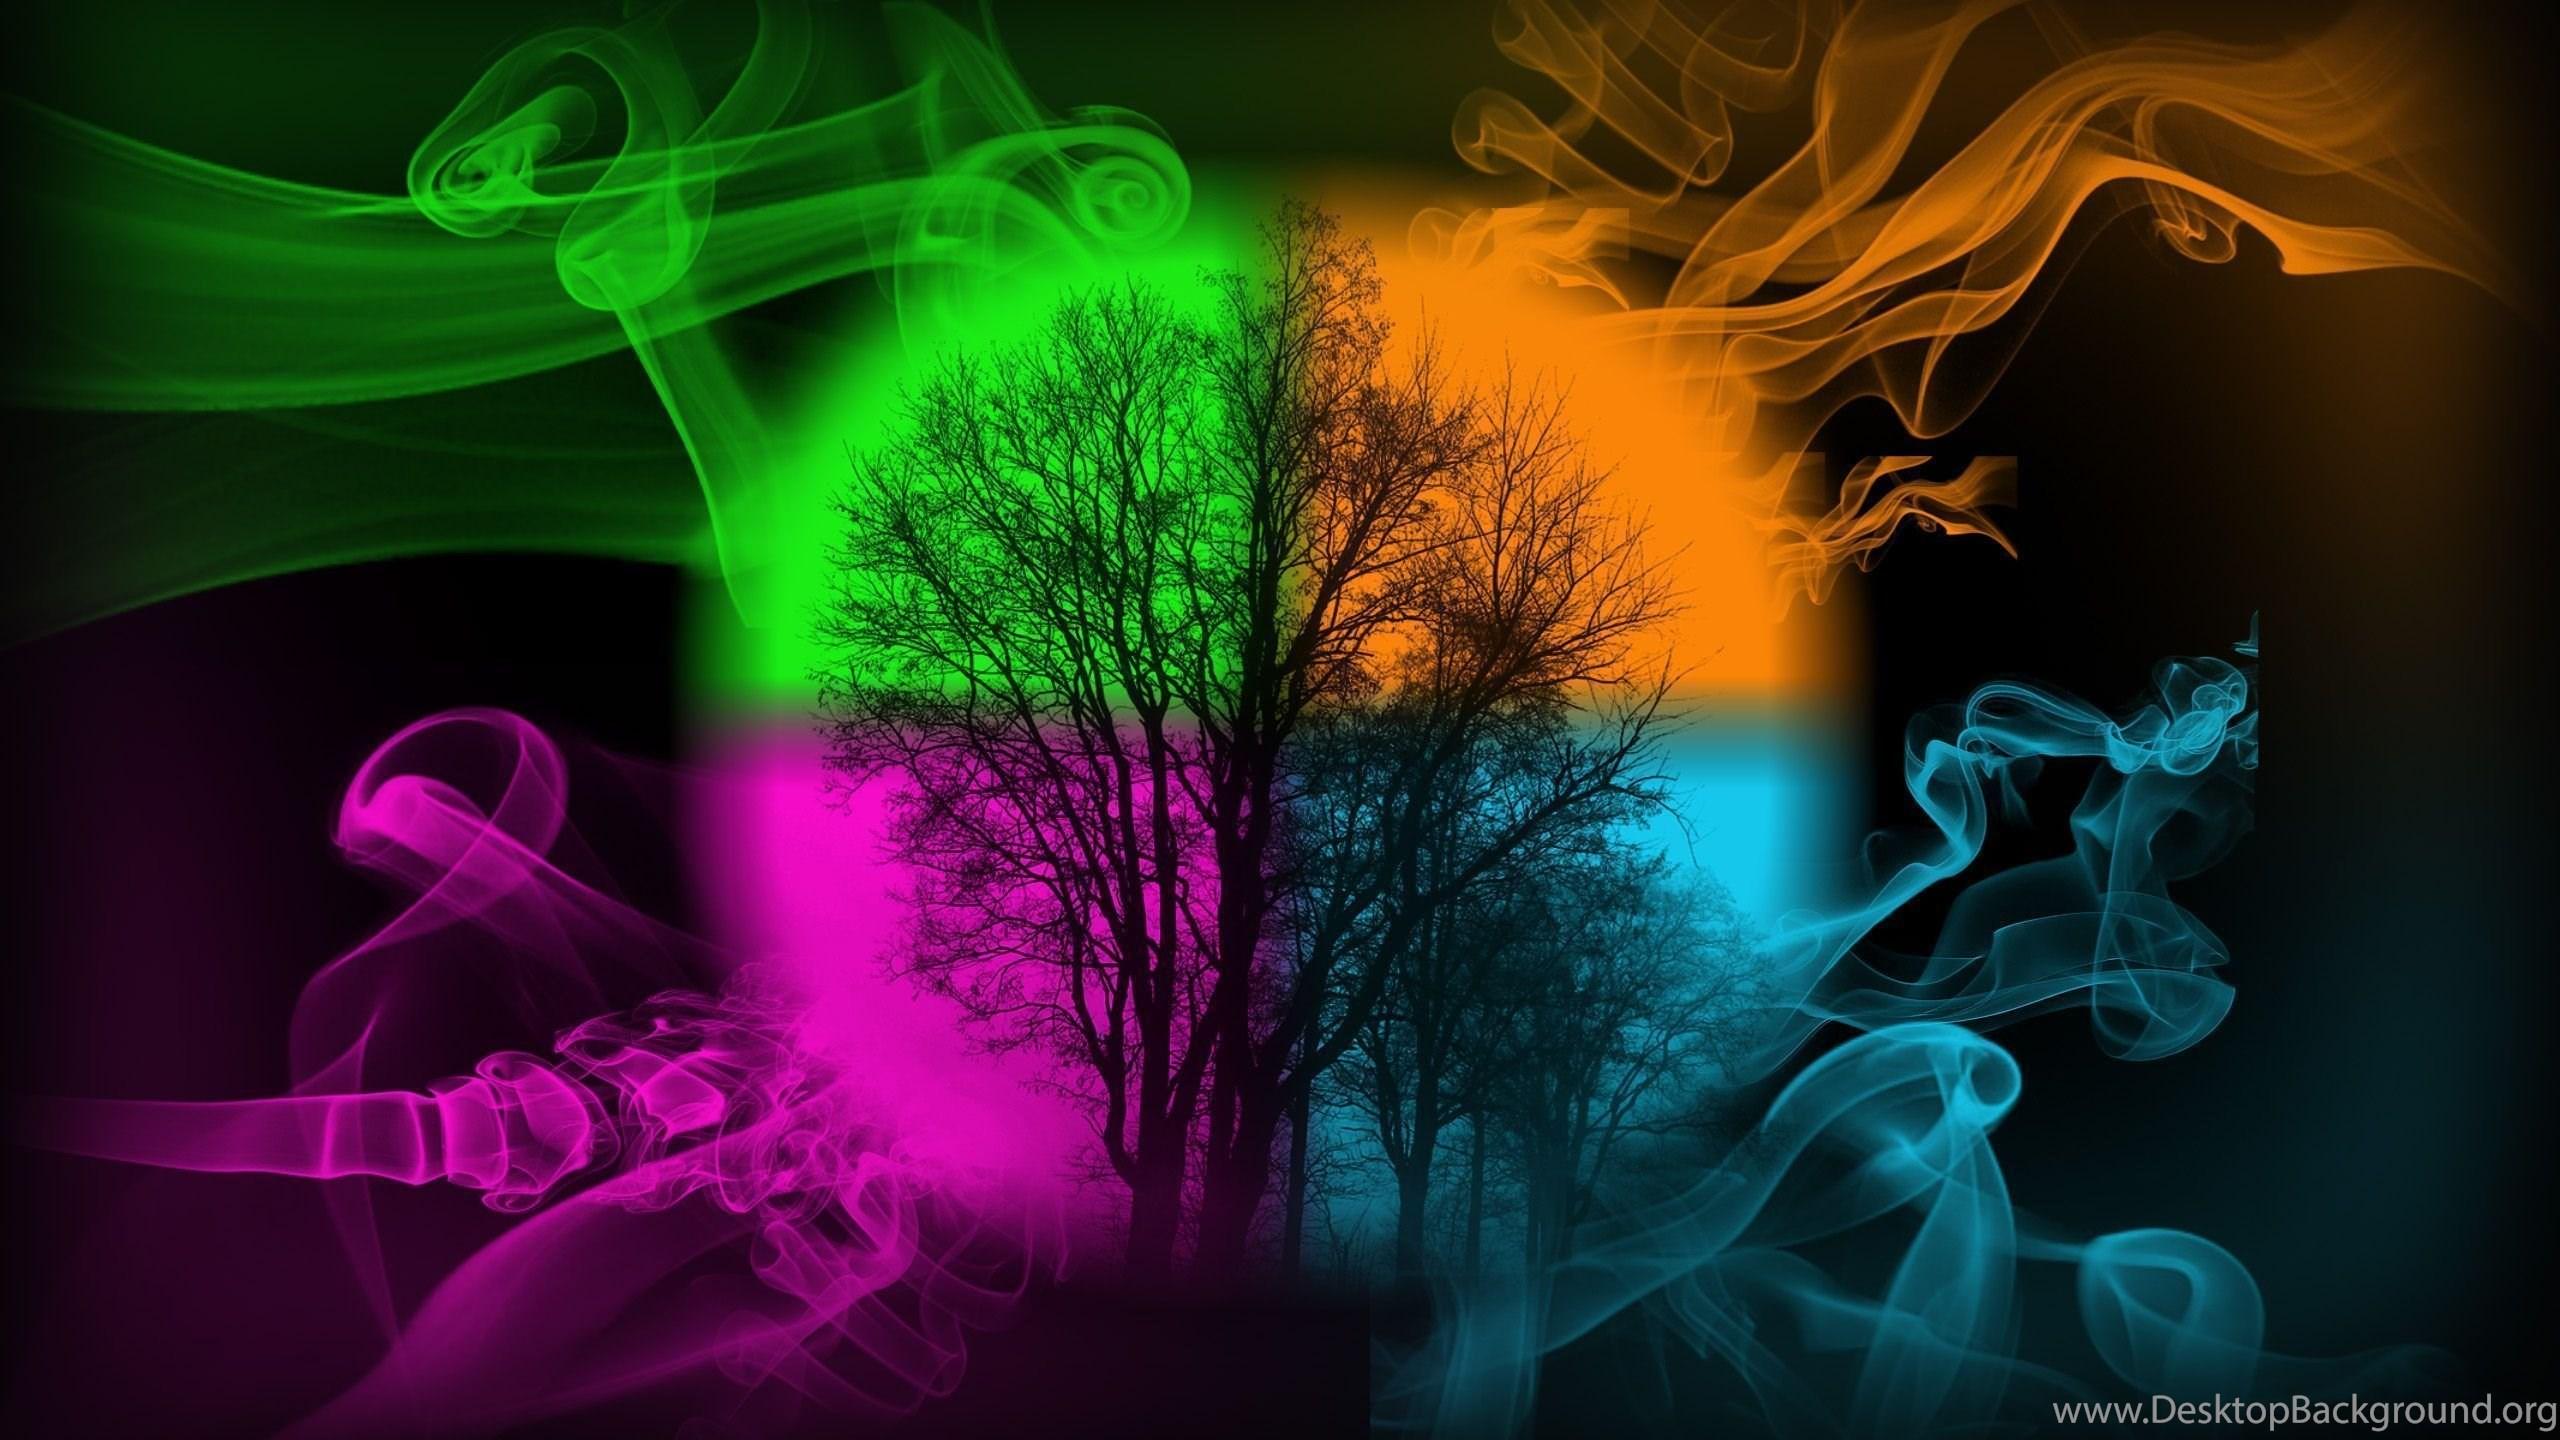 wallpapers colorful smokemeronol on deviantart desktop background